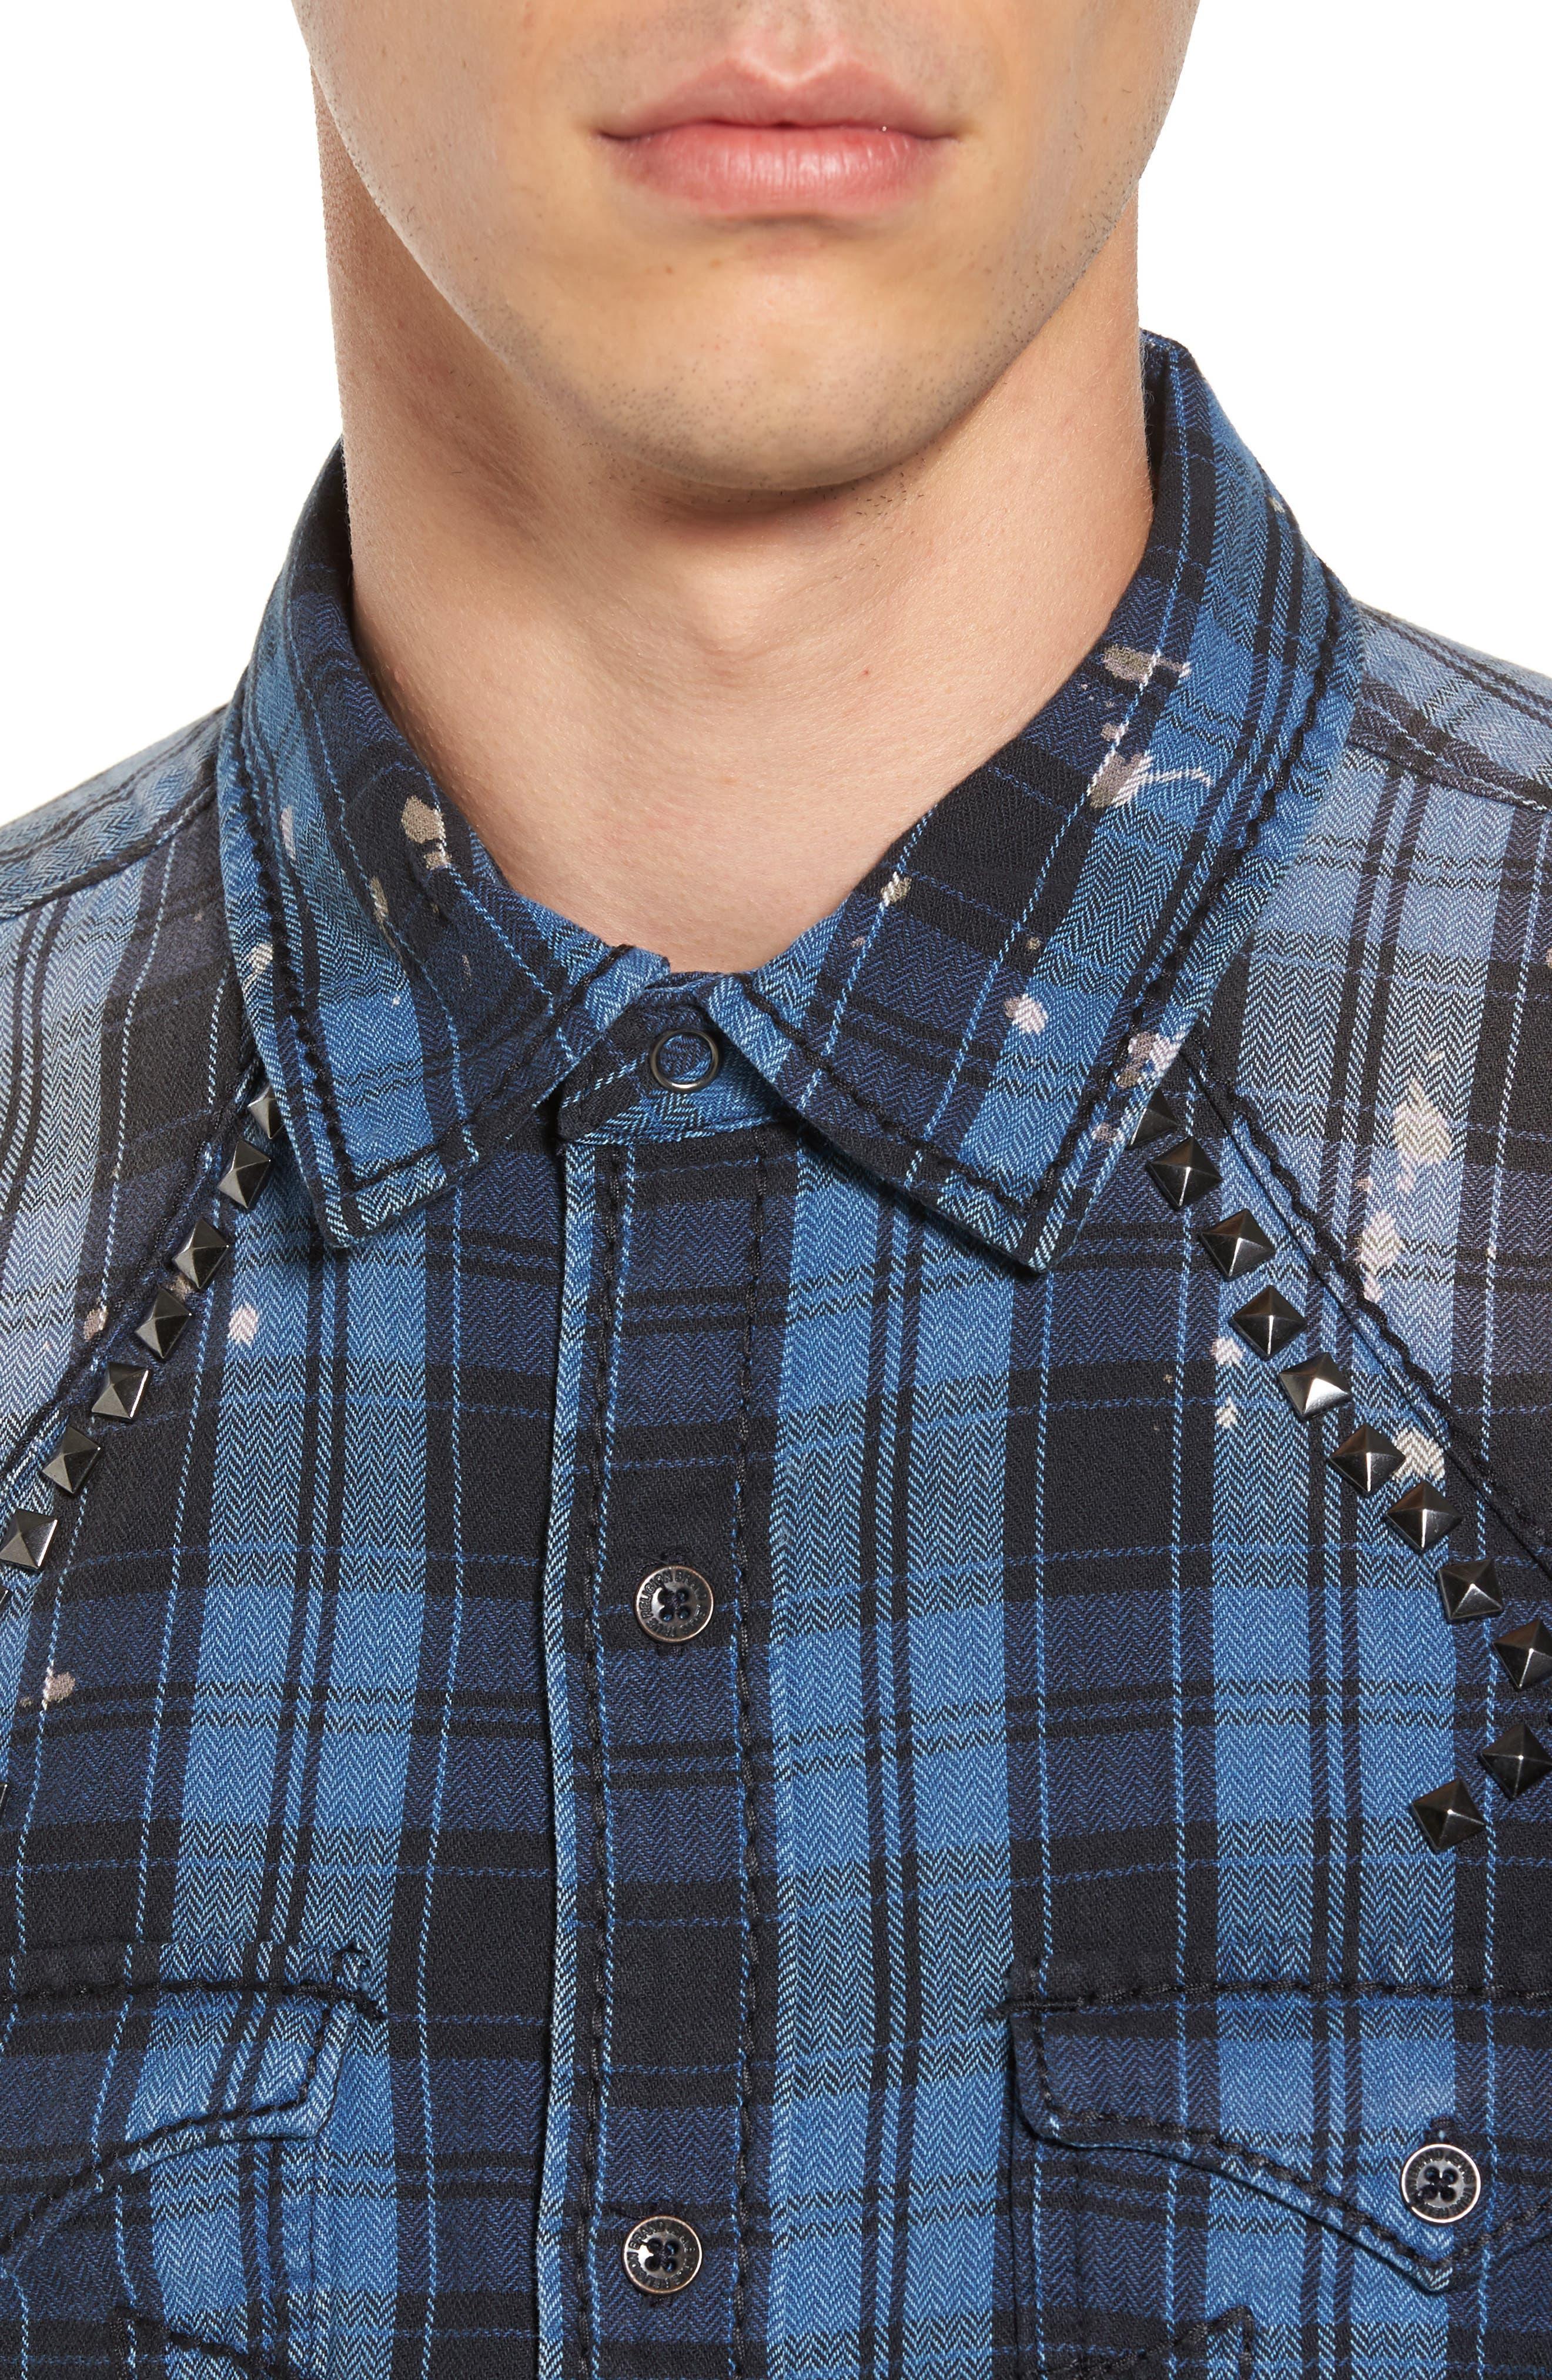 Studded Shirt,                             Alternate thumbnail 4, color,                             400